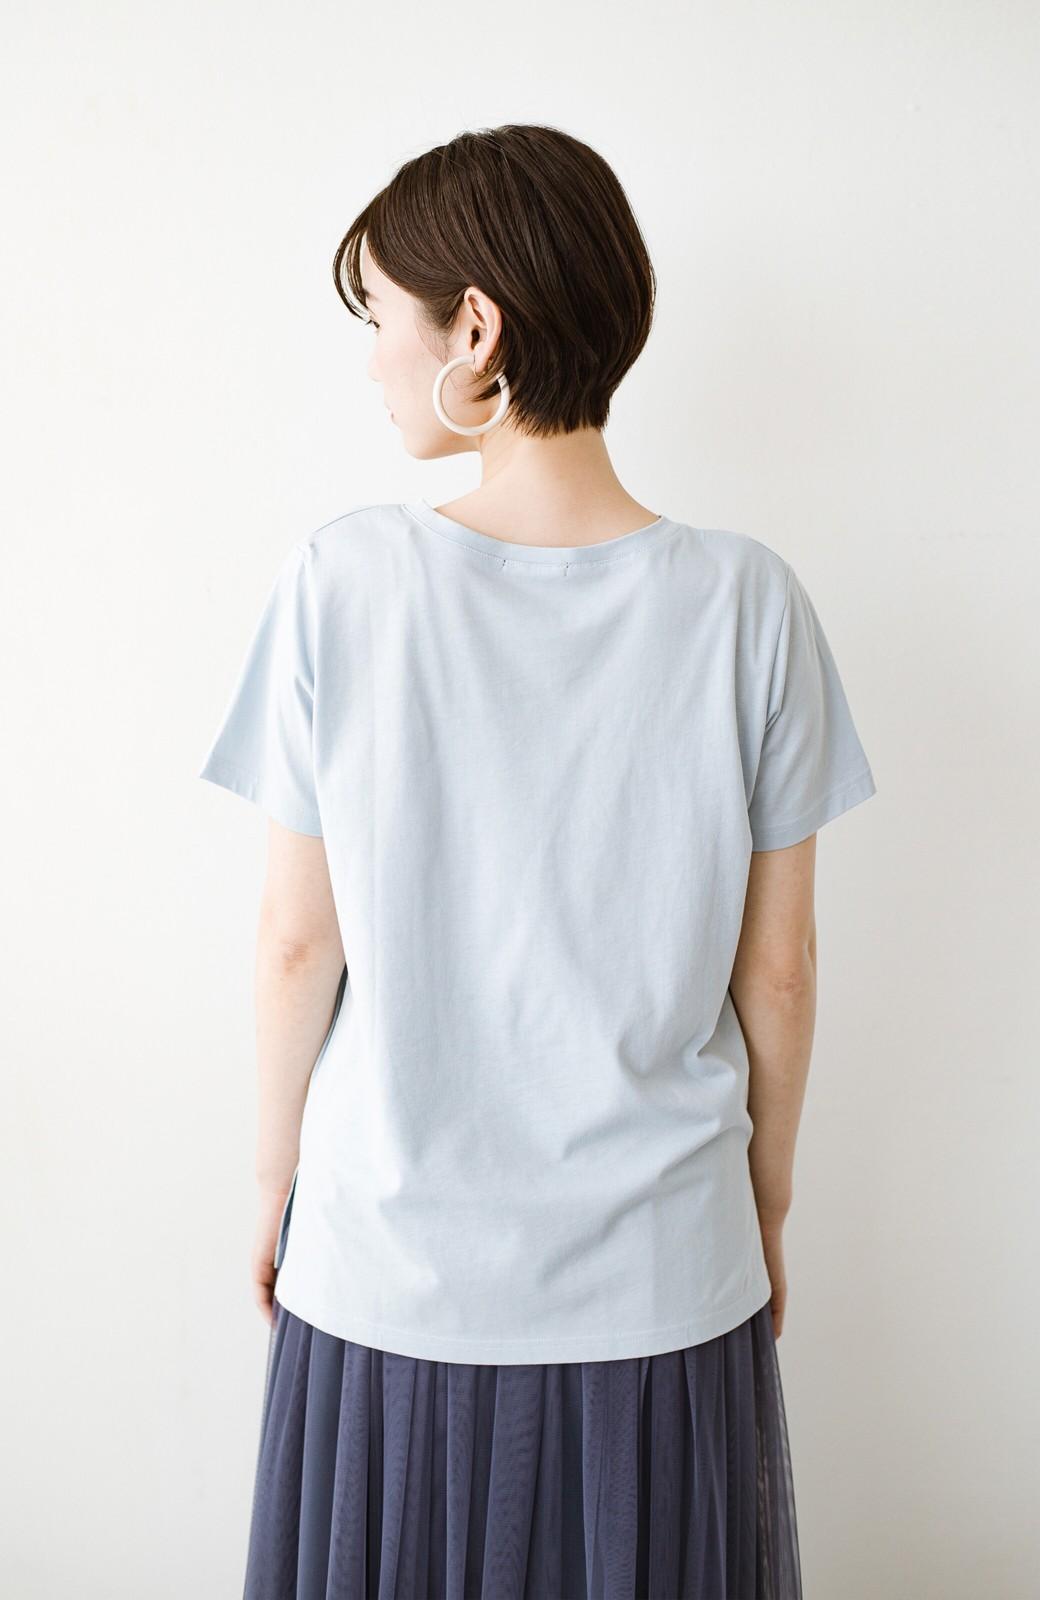 haco! 汗染み軽減加工で安心!1枚でも重ね着にも便利なシンプルTシャツ by ZAMPA <サックスブルー>の商品写真12